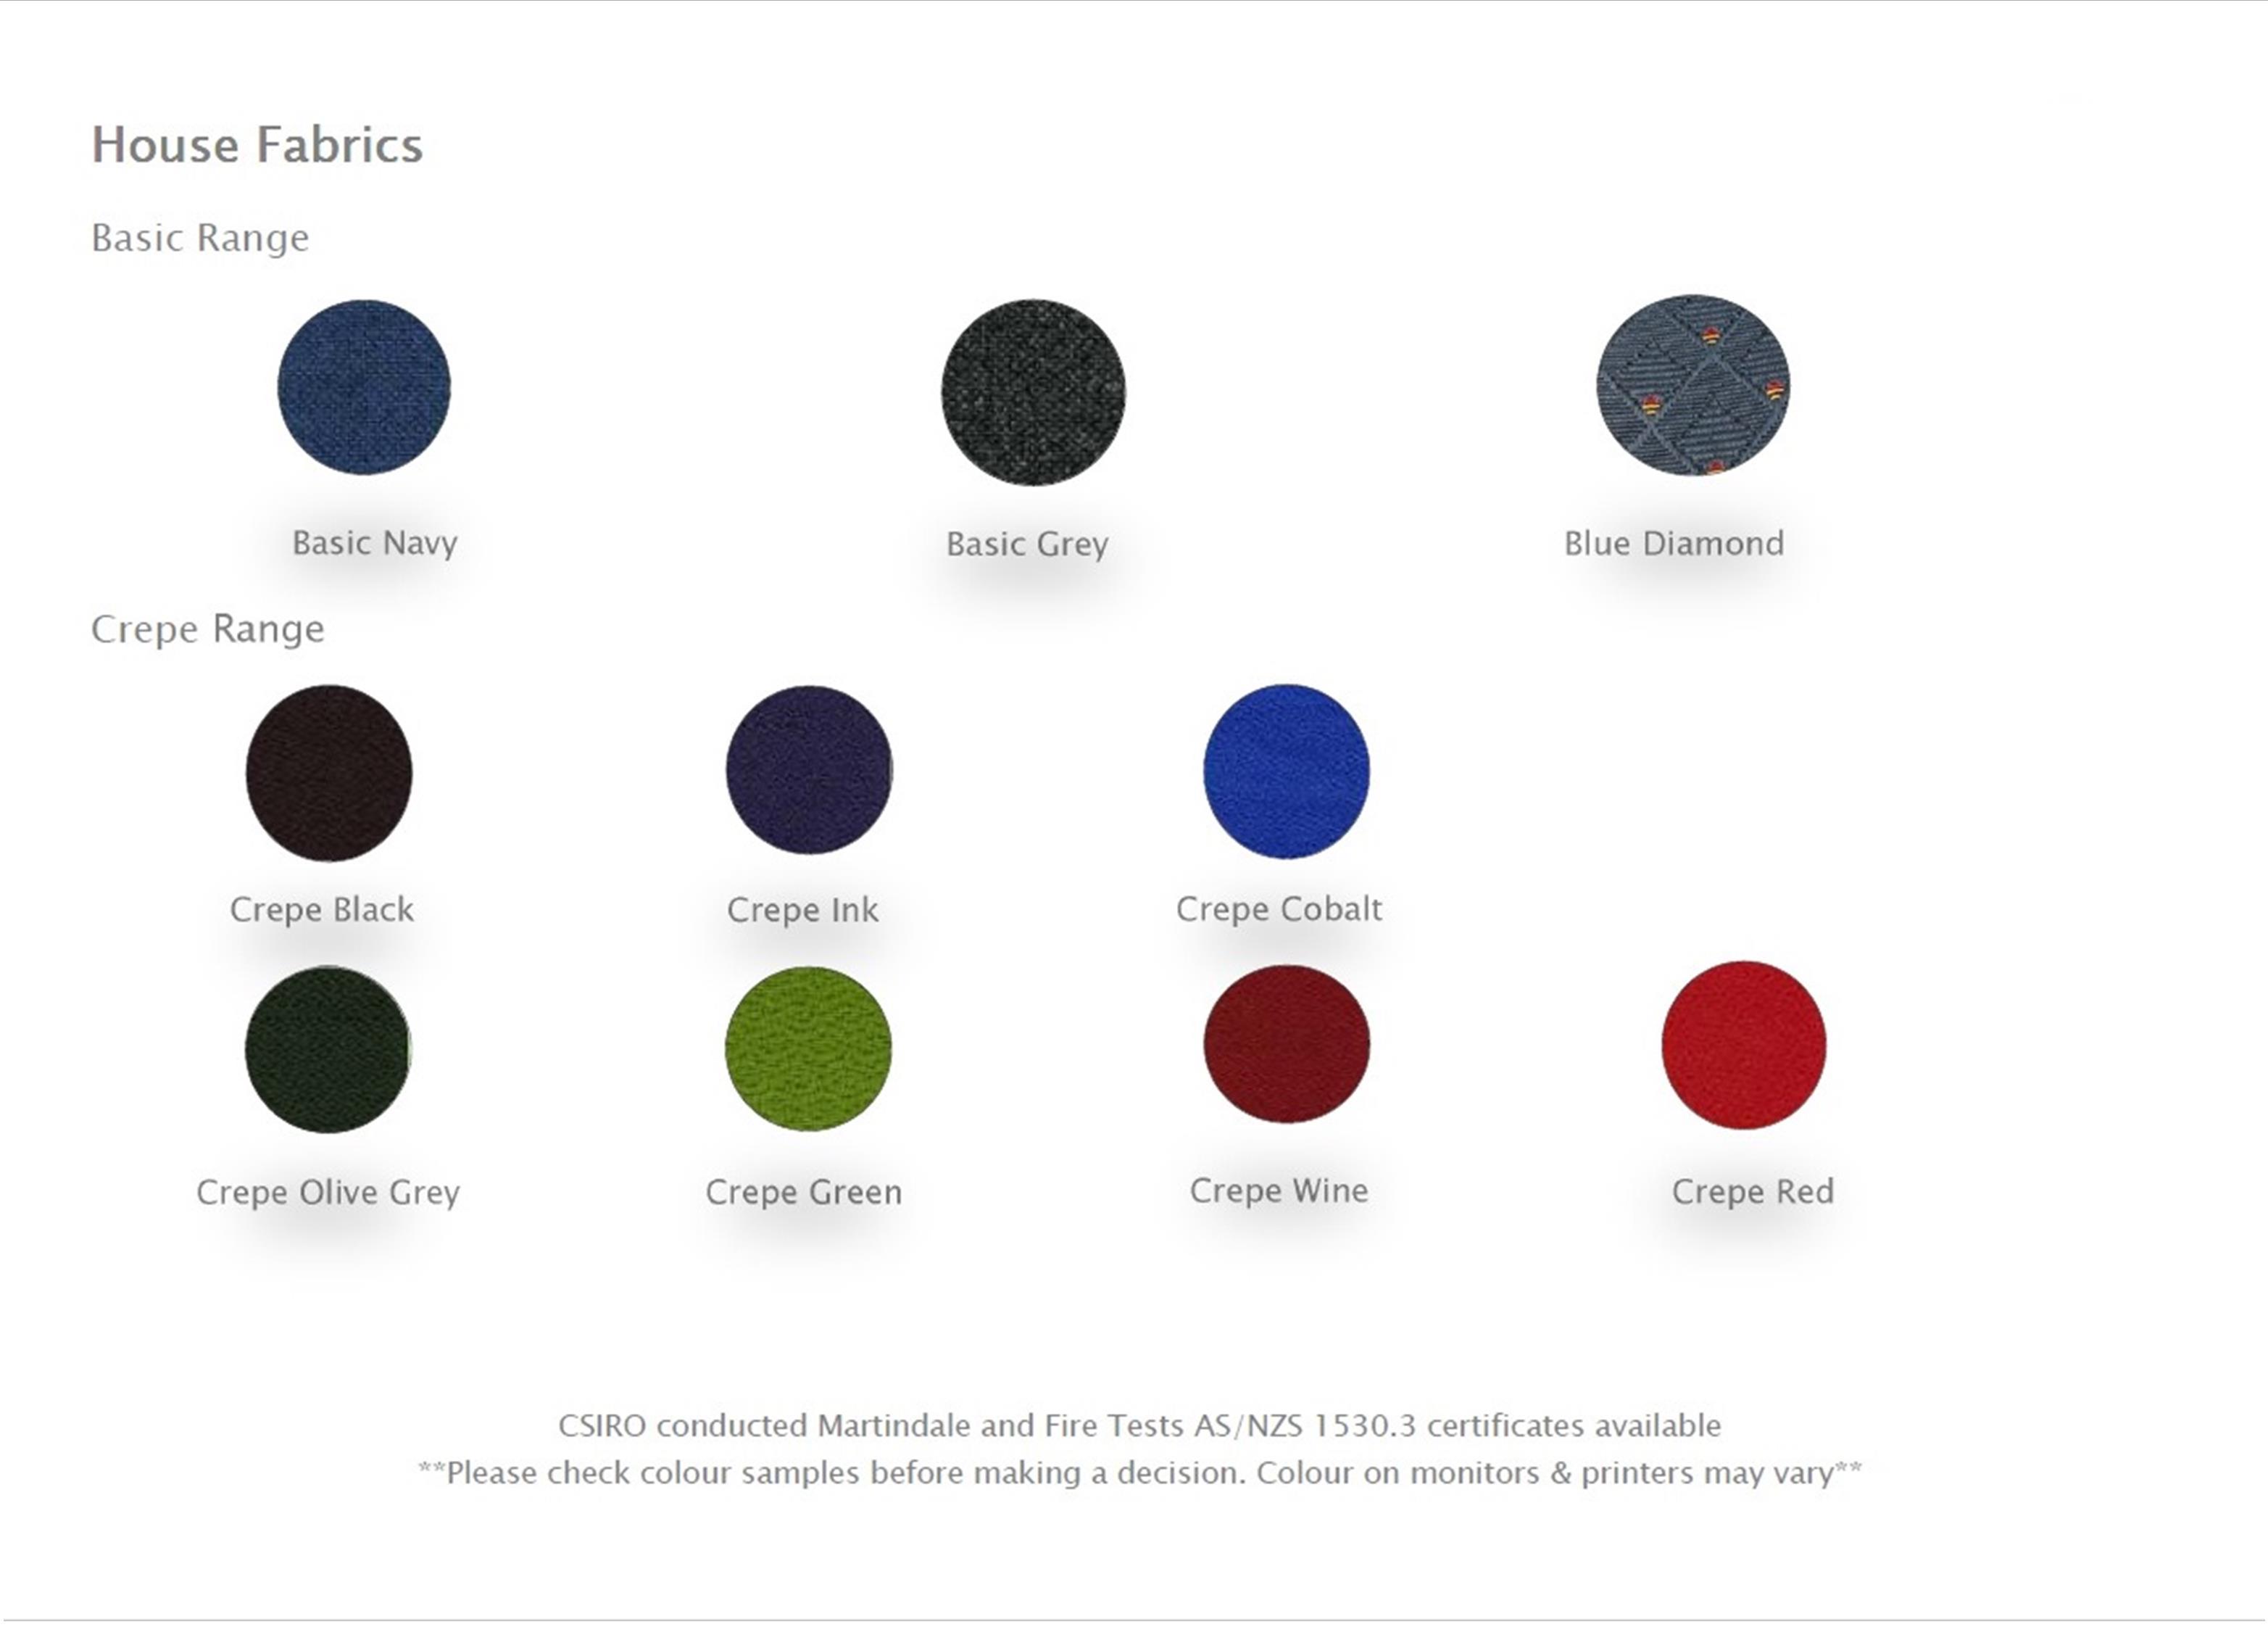 House Fabrics